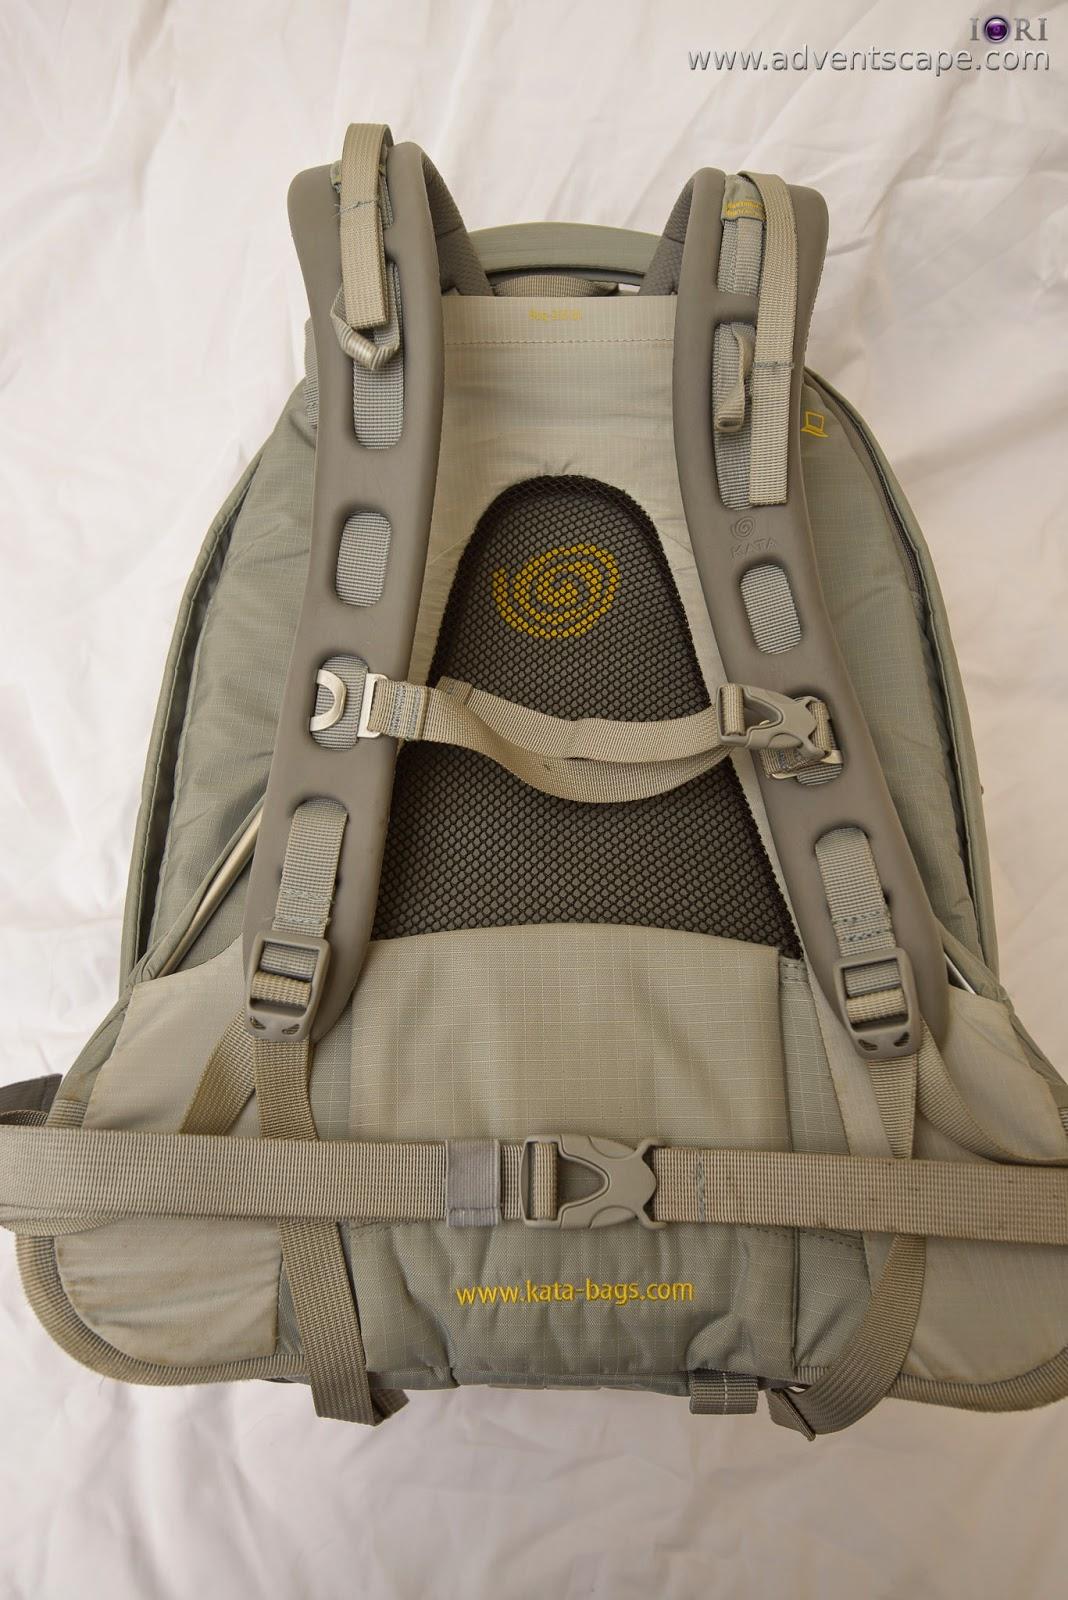 205, adventscape, Australian Landscape Photographer, bag, Bug, Kata, Manfrotto, Philip Avellana, review, strap, sticky rubber